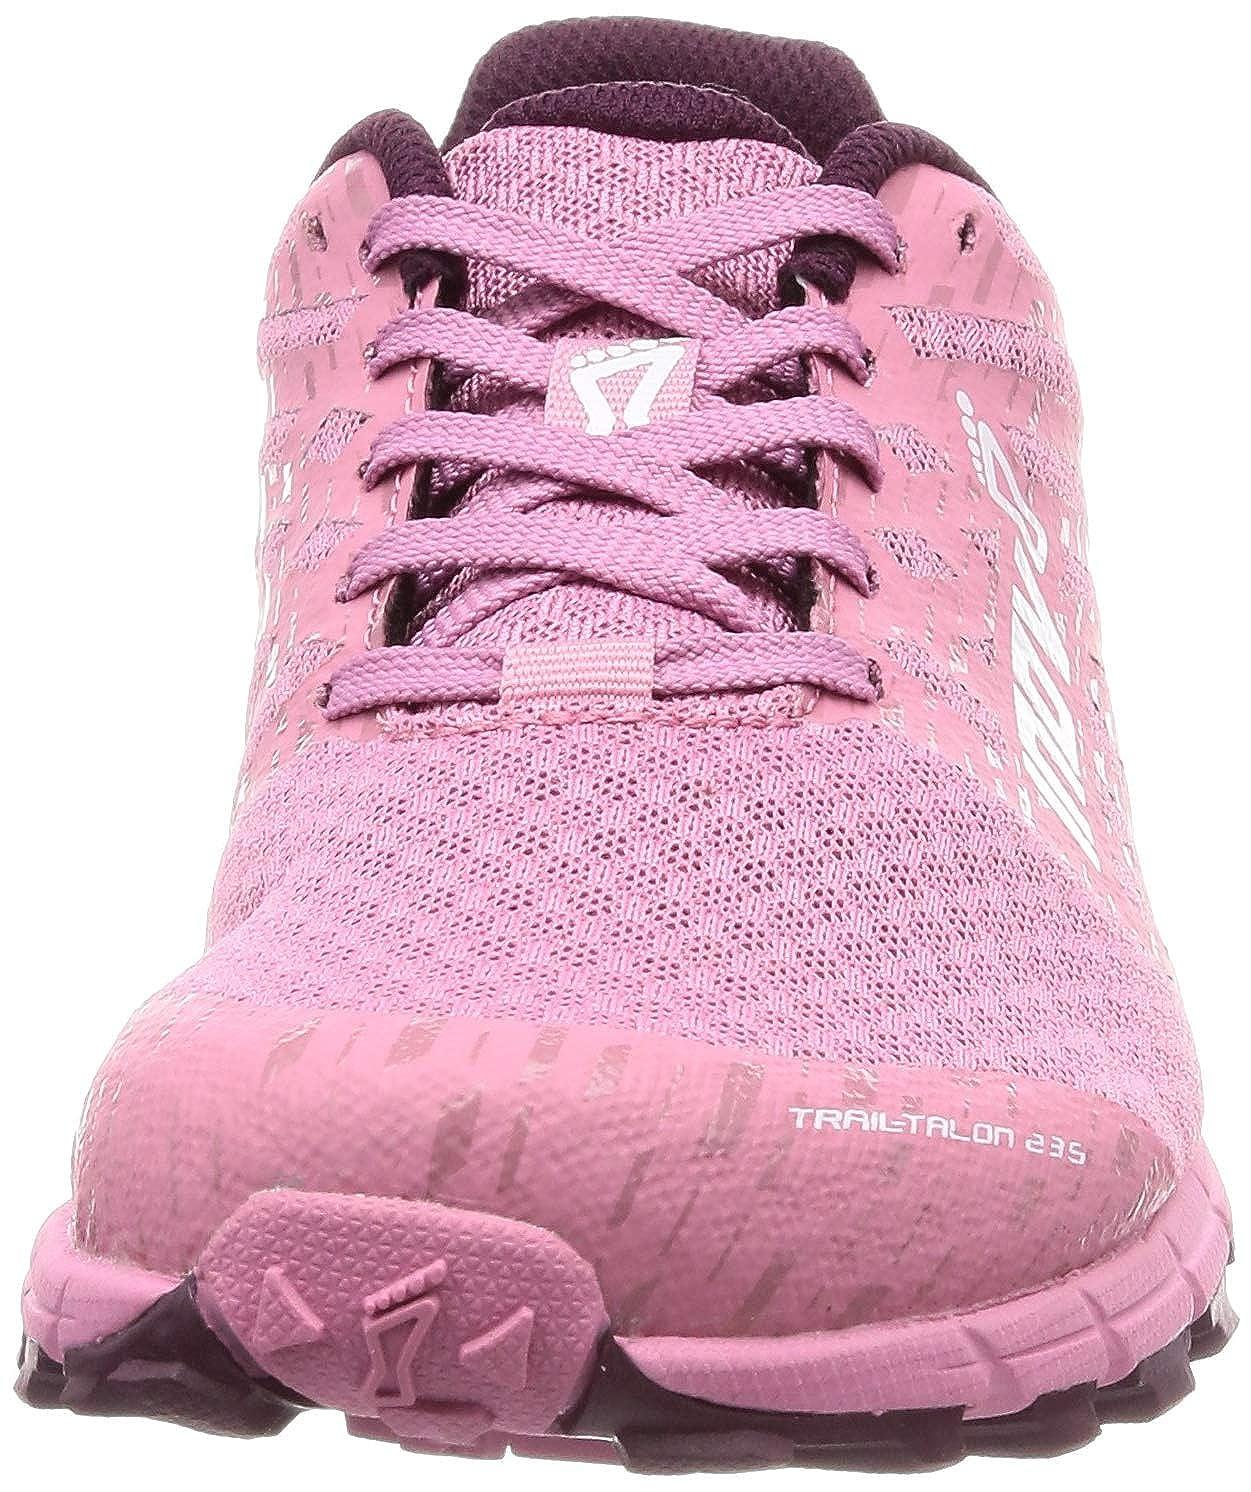 Inov-8 Damen Trailtalon 235 235 235 Schuhe Trailrunningschuhe 795f1d